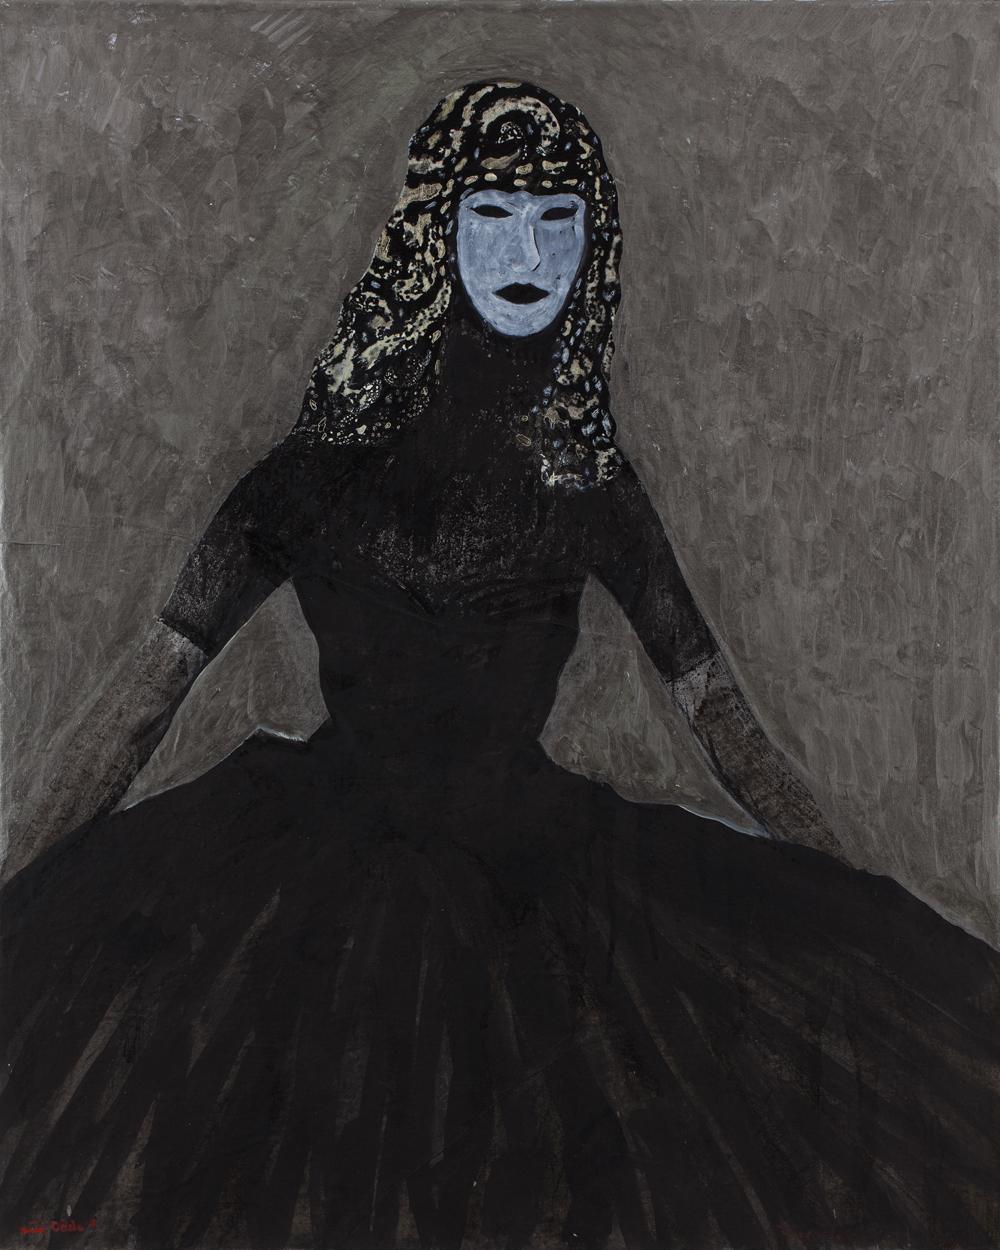 Canvas_Lady Murasaki_102x83,5cm_Acrylic on paper and canvas_2013